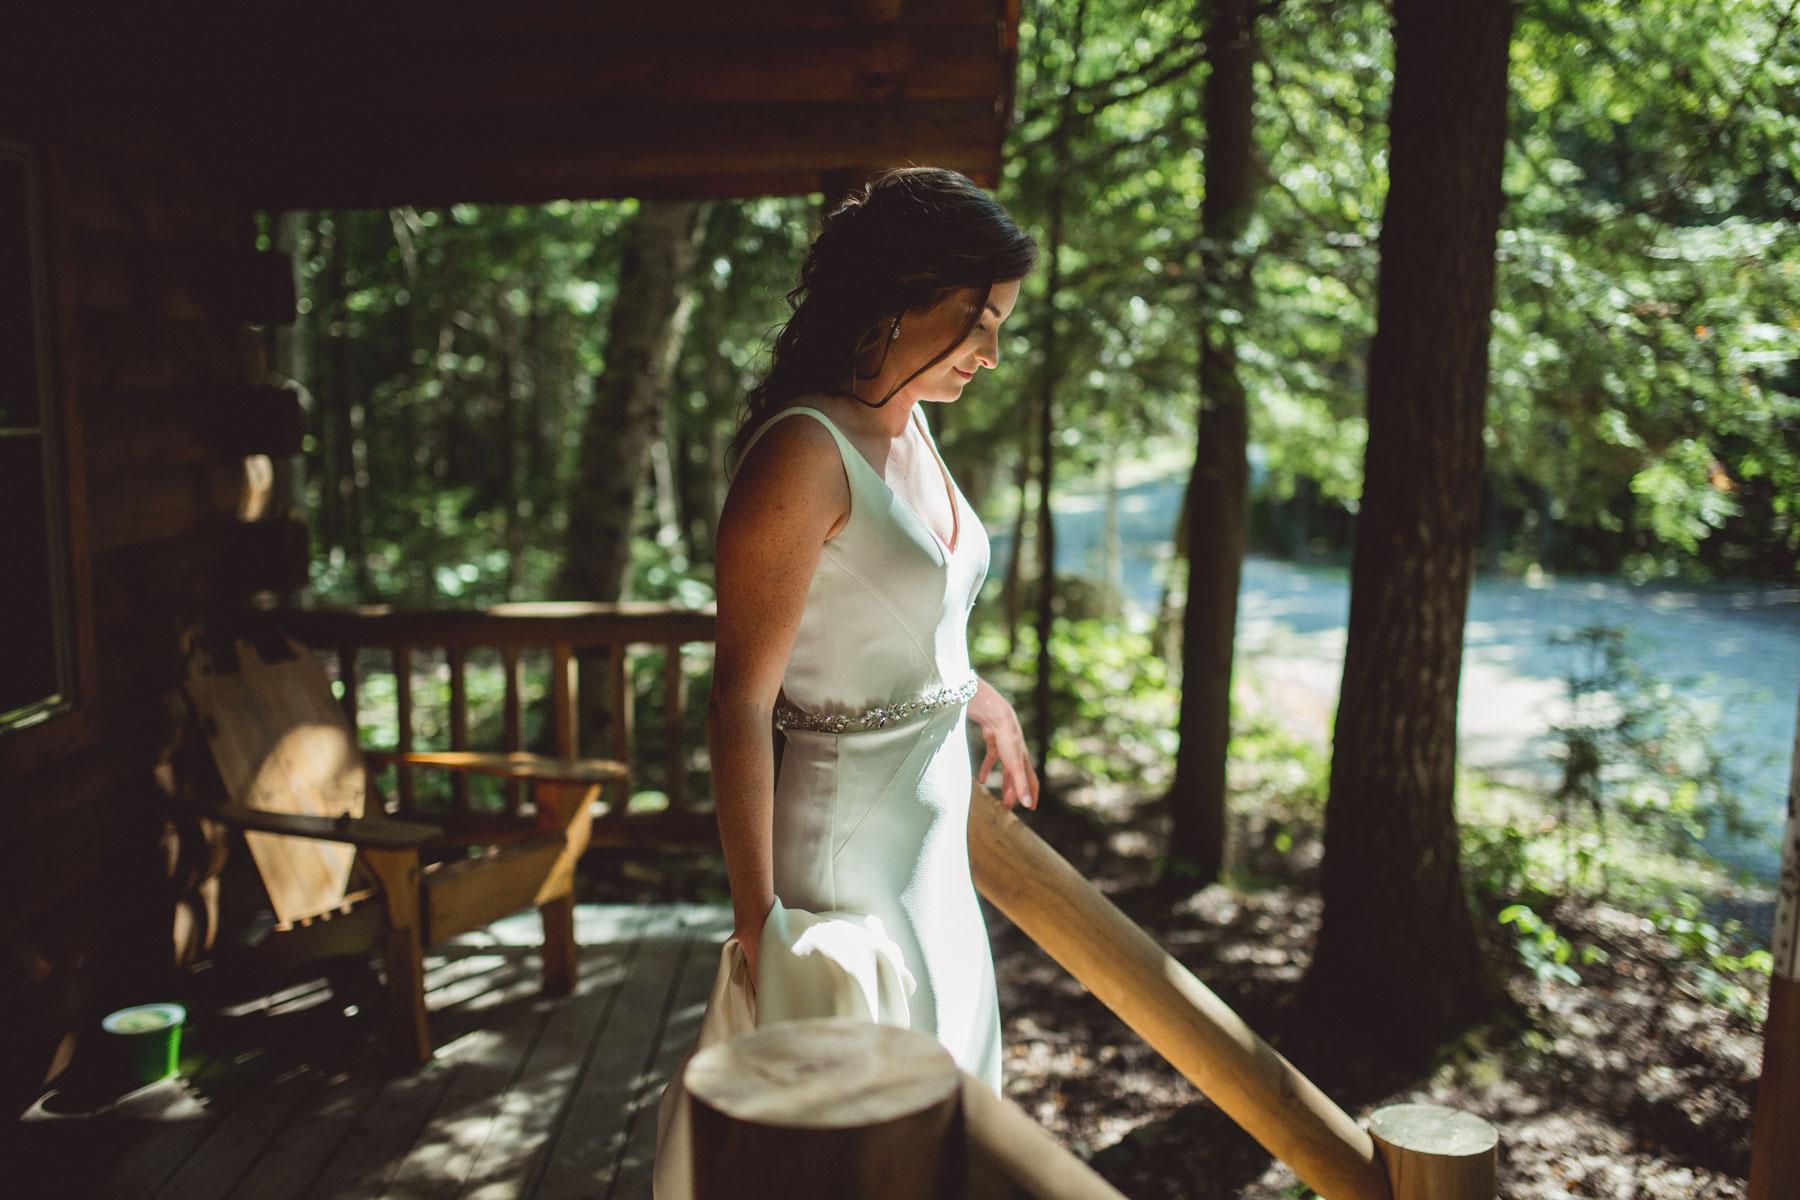 Wedding-Photography-Campground-4.jpg